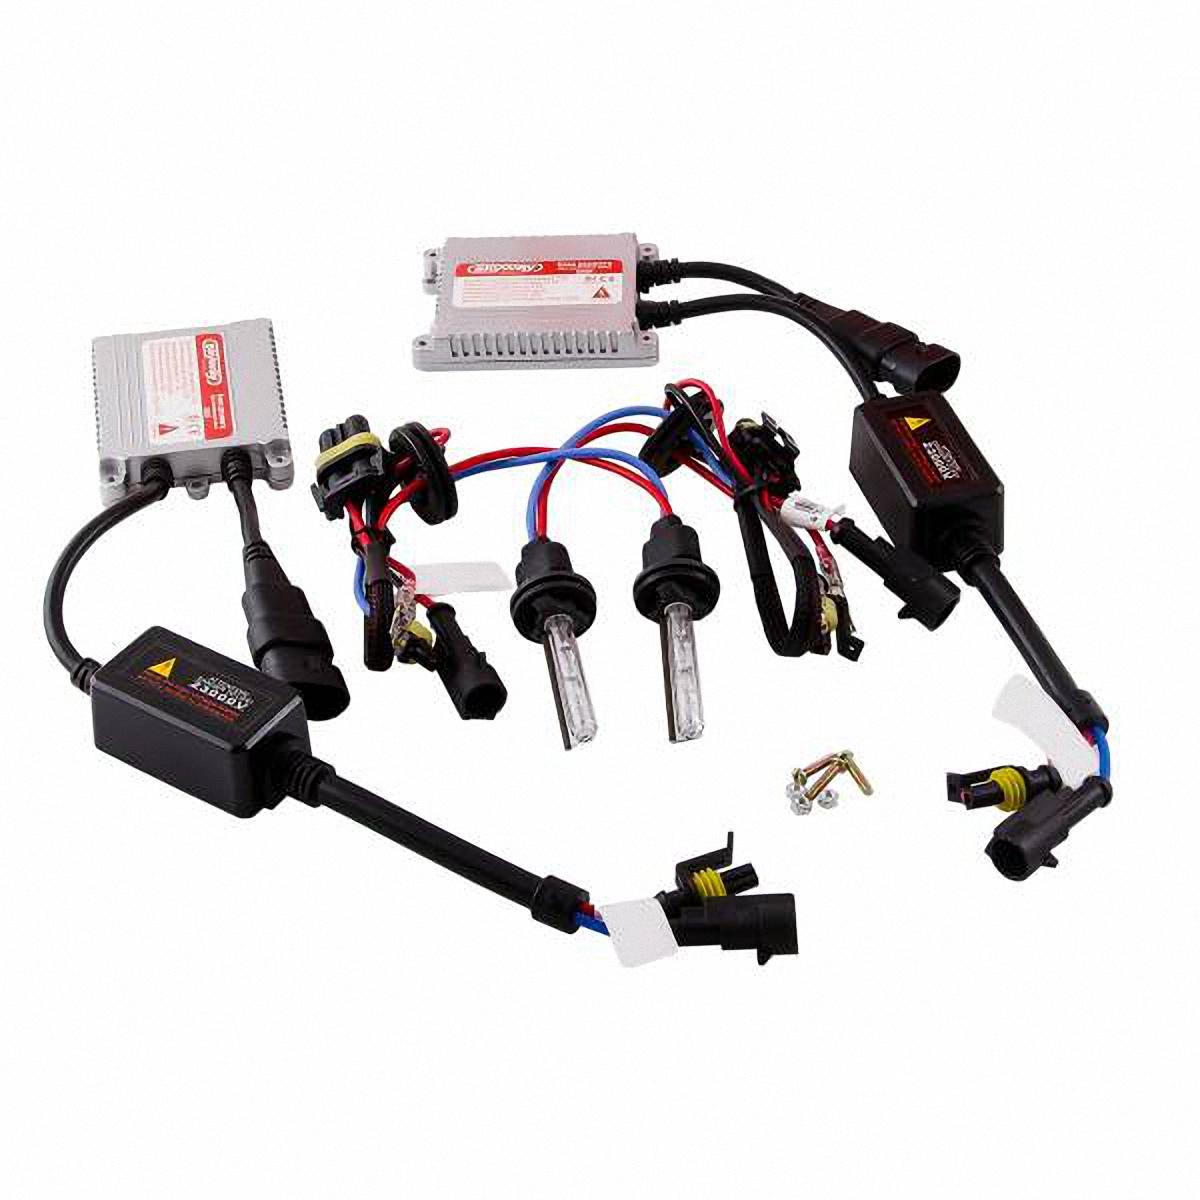 Skyway Автолампа ксенон H3. SH3 5000K D13 12V35WS03301004Комплектация:Лампа газоразрядная ксеноновая – 2 шт.Блок розжига – 2 шт.Винты для блока розжига – 6 шт.Гарантийный талон – 1 шт.Инструкция - 1 шт.